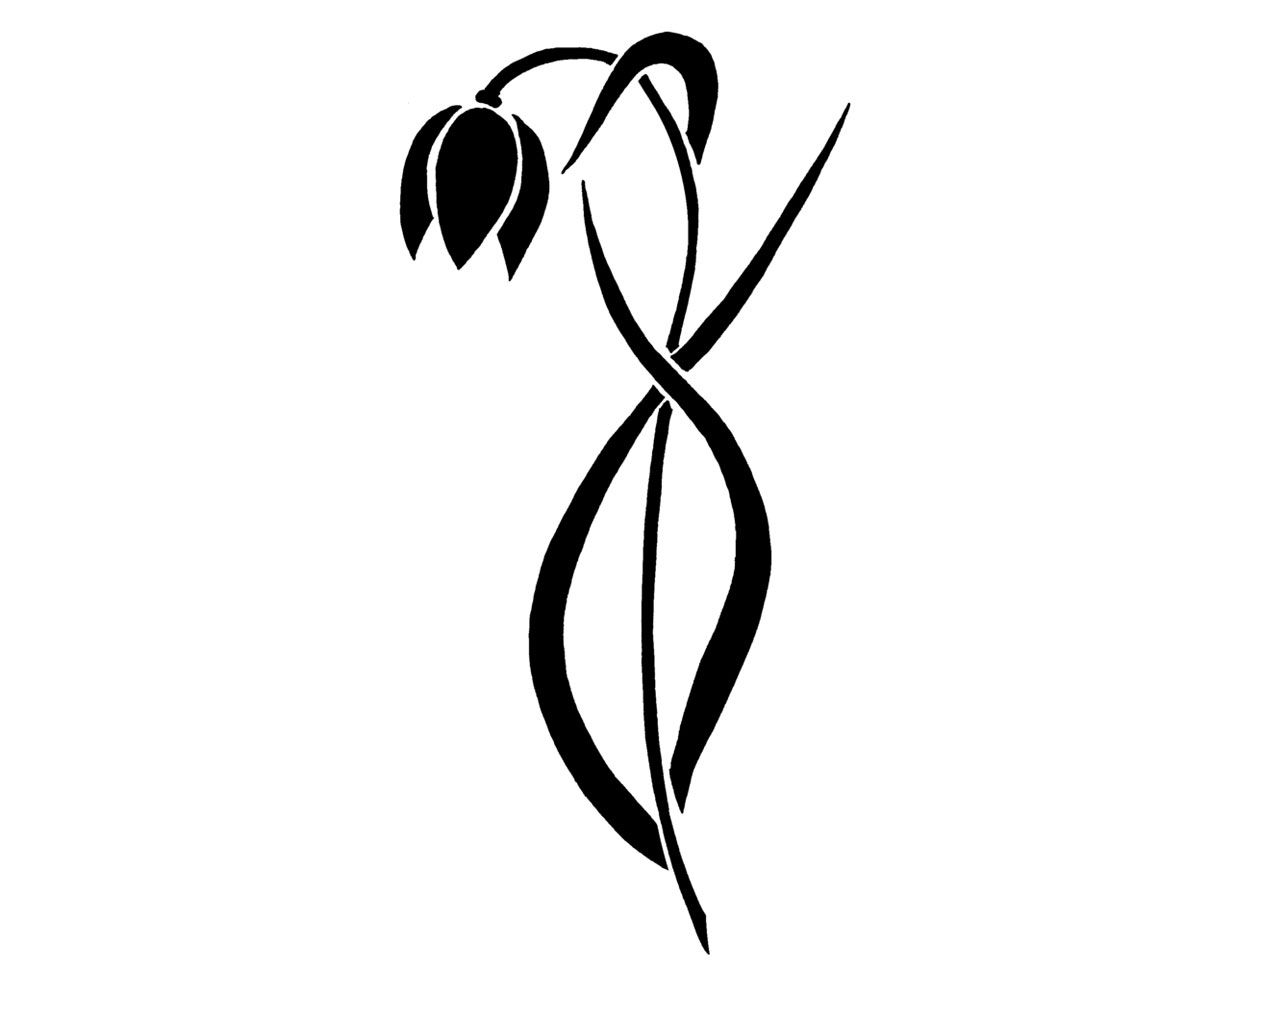 30 of the best virgo tattoo designs tattoo easily - 4182 Free Designs Simple Tribal Flower Tattoo Wallpaper